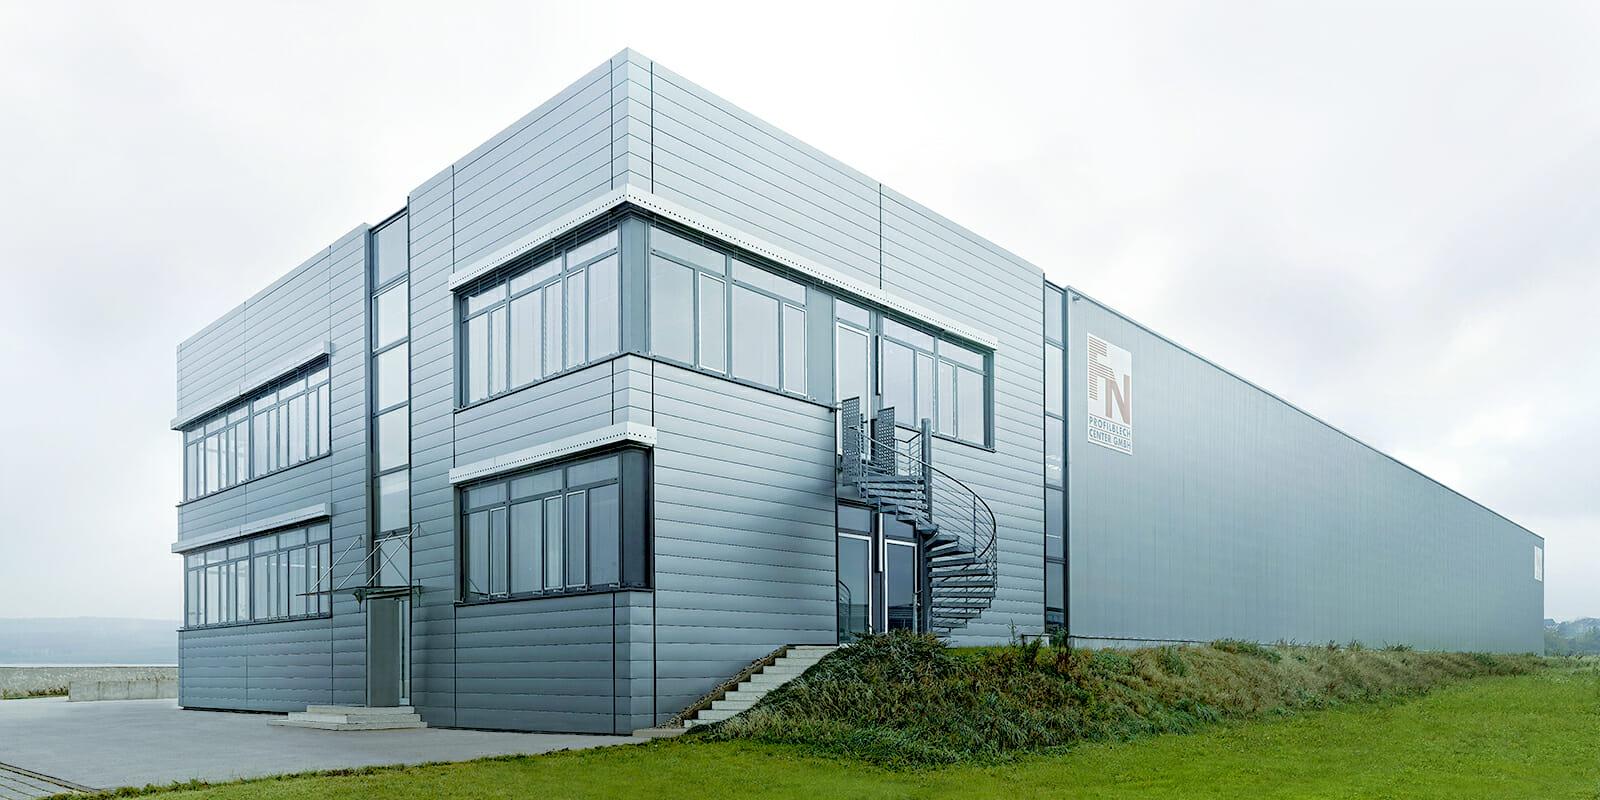 FN, 09366 Niederdorf